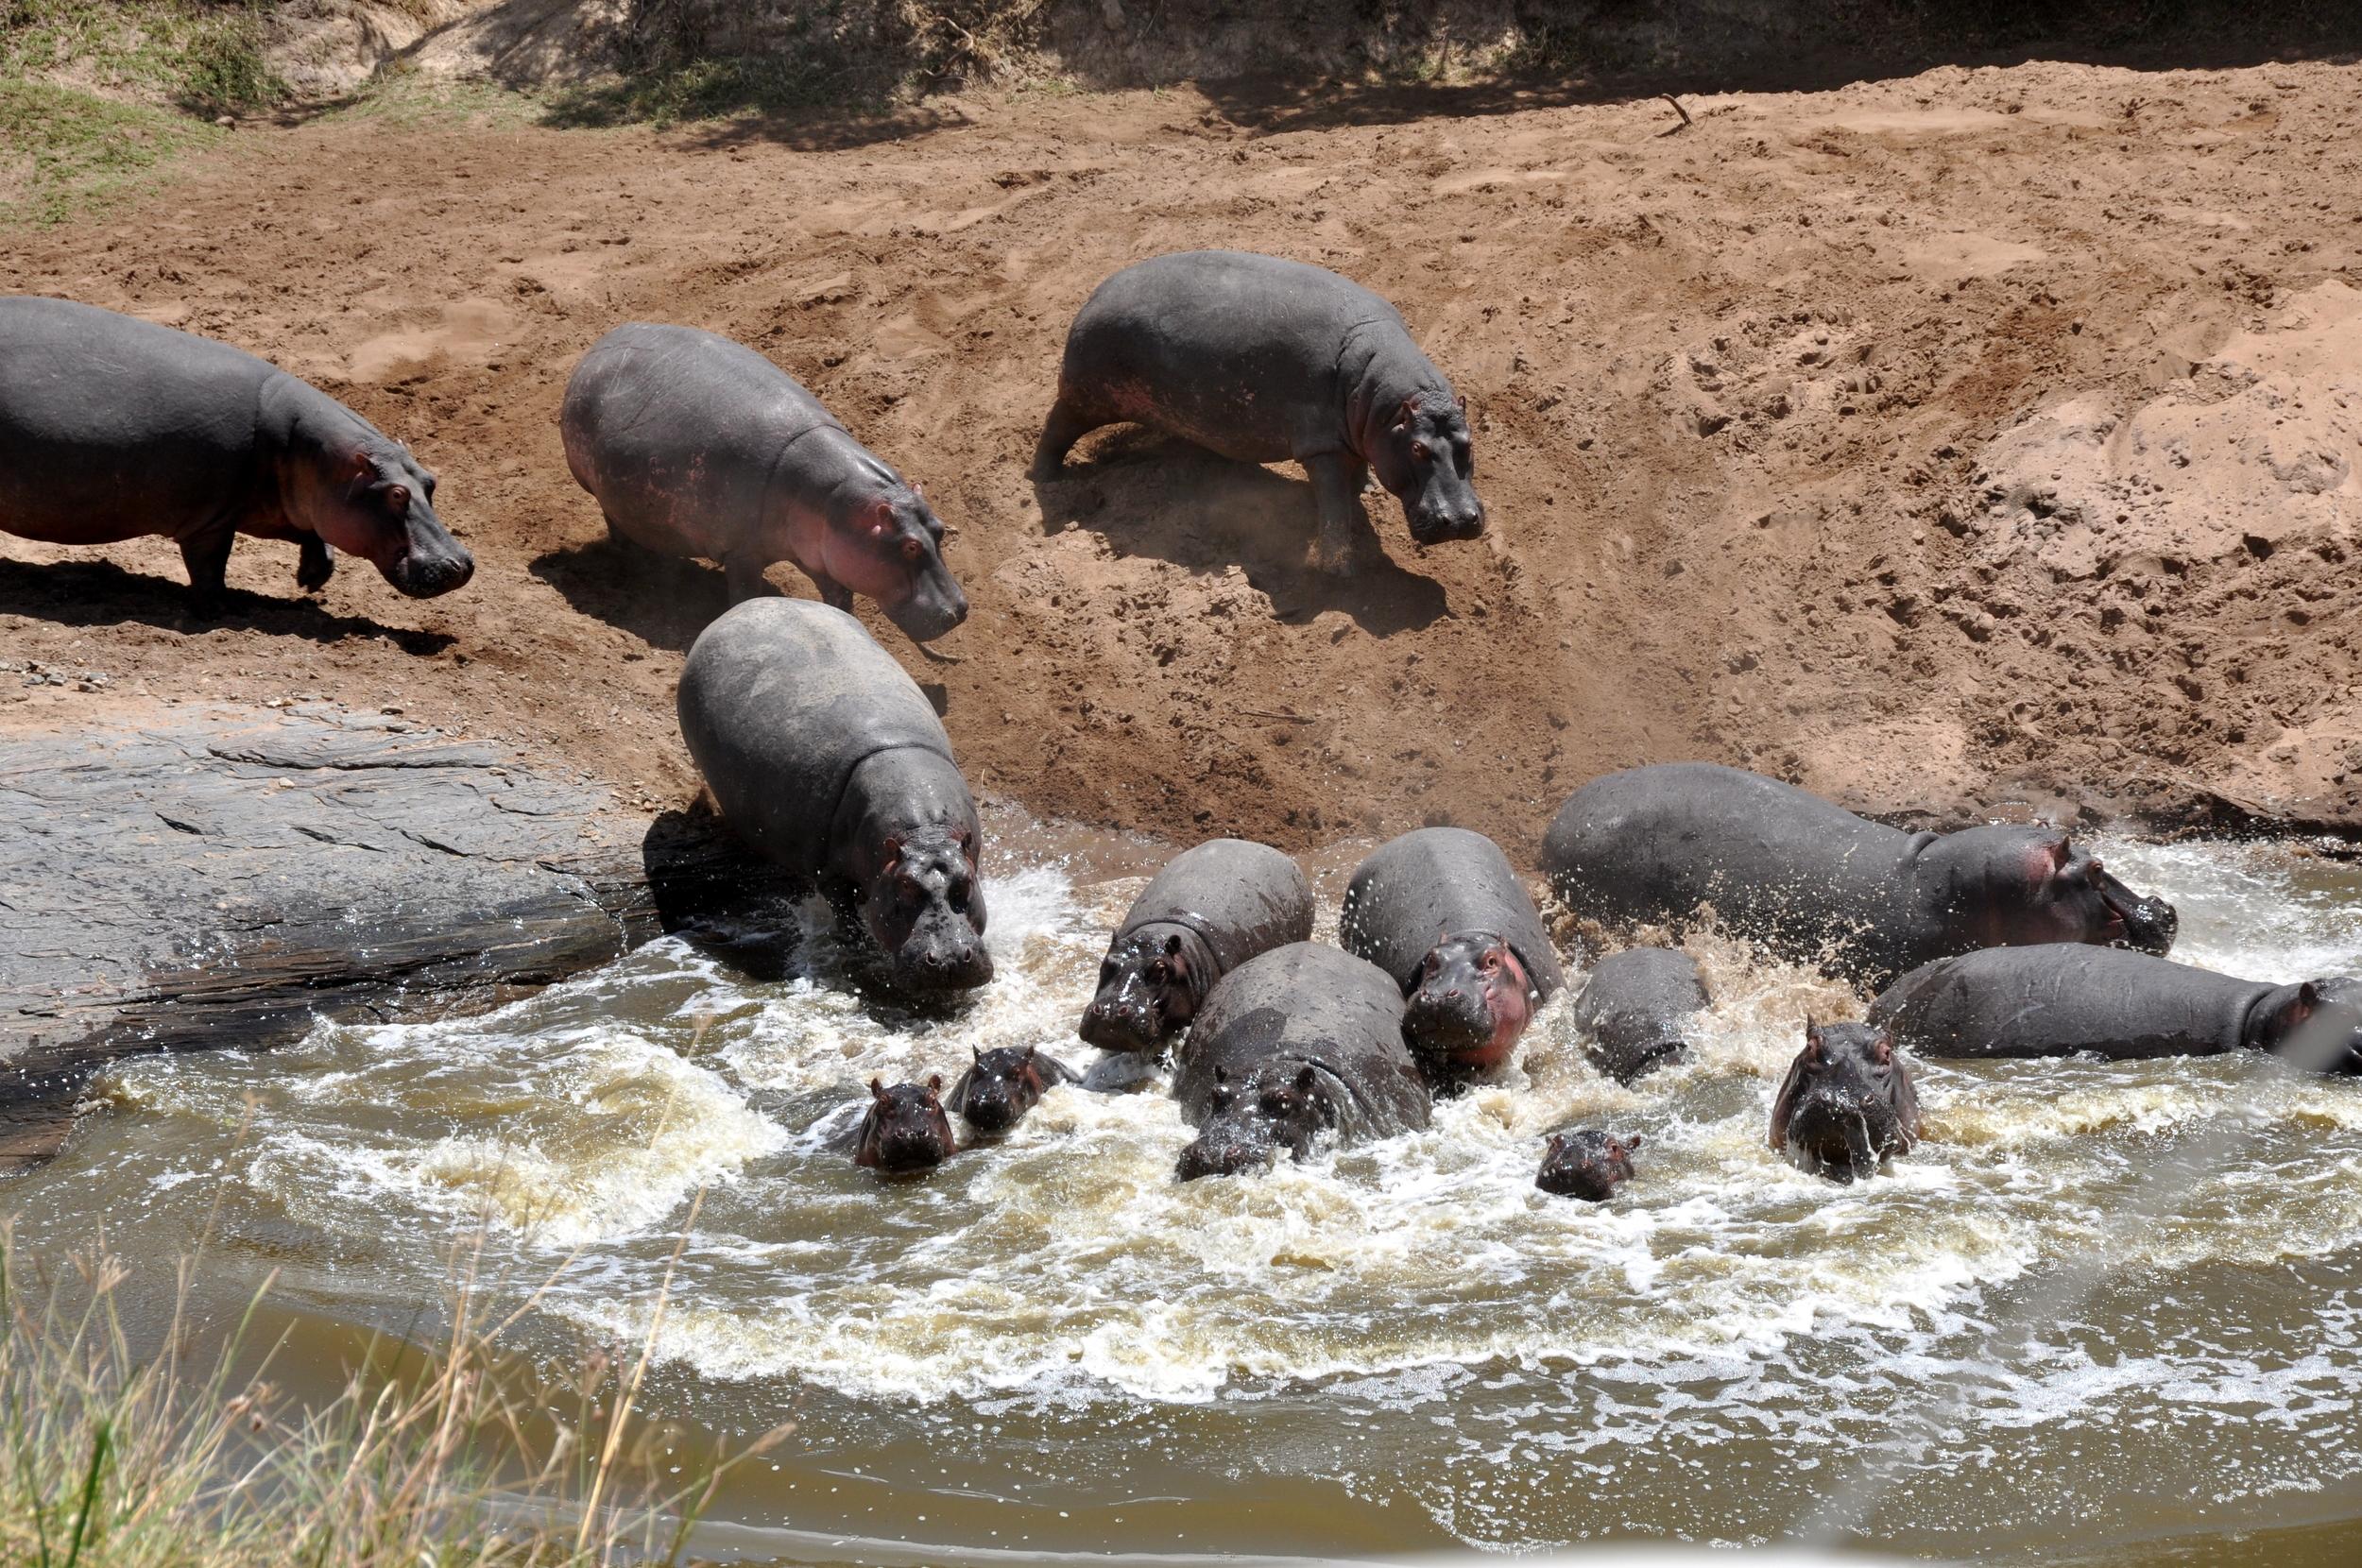 Hippopotamus, Hippos in Maasai Mara, Kenya